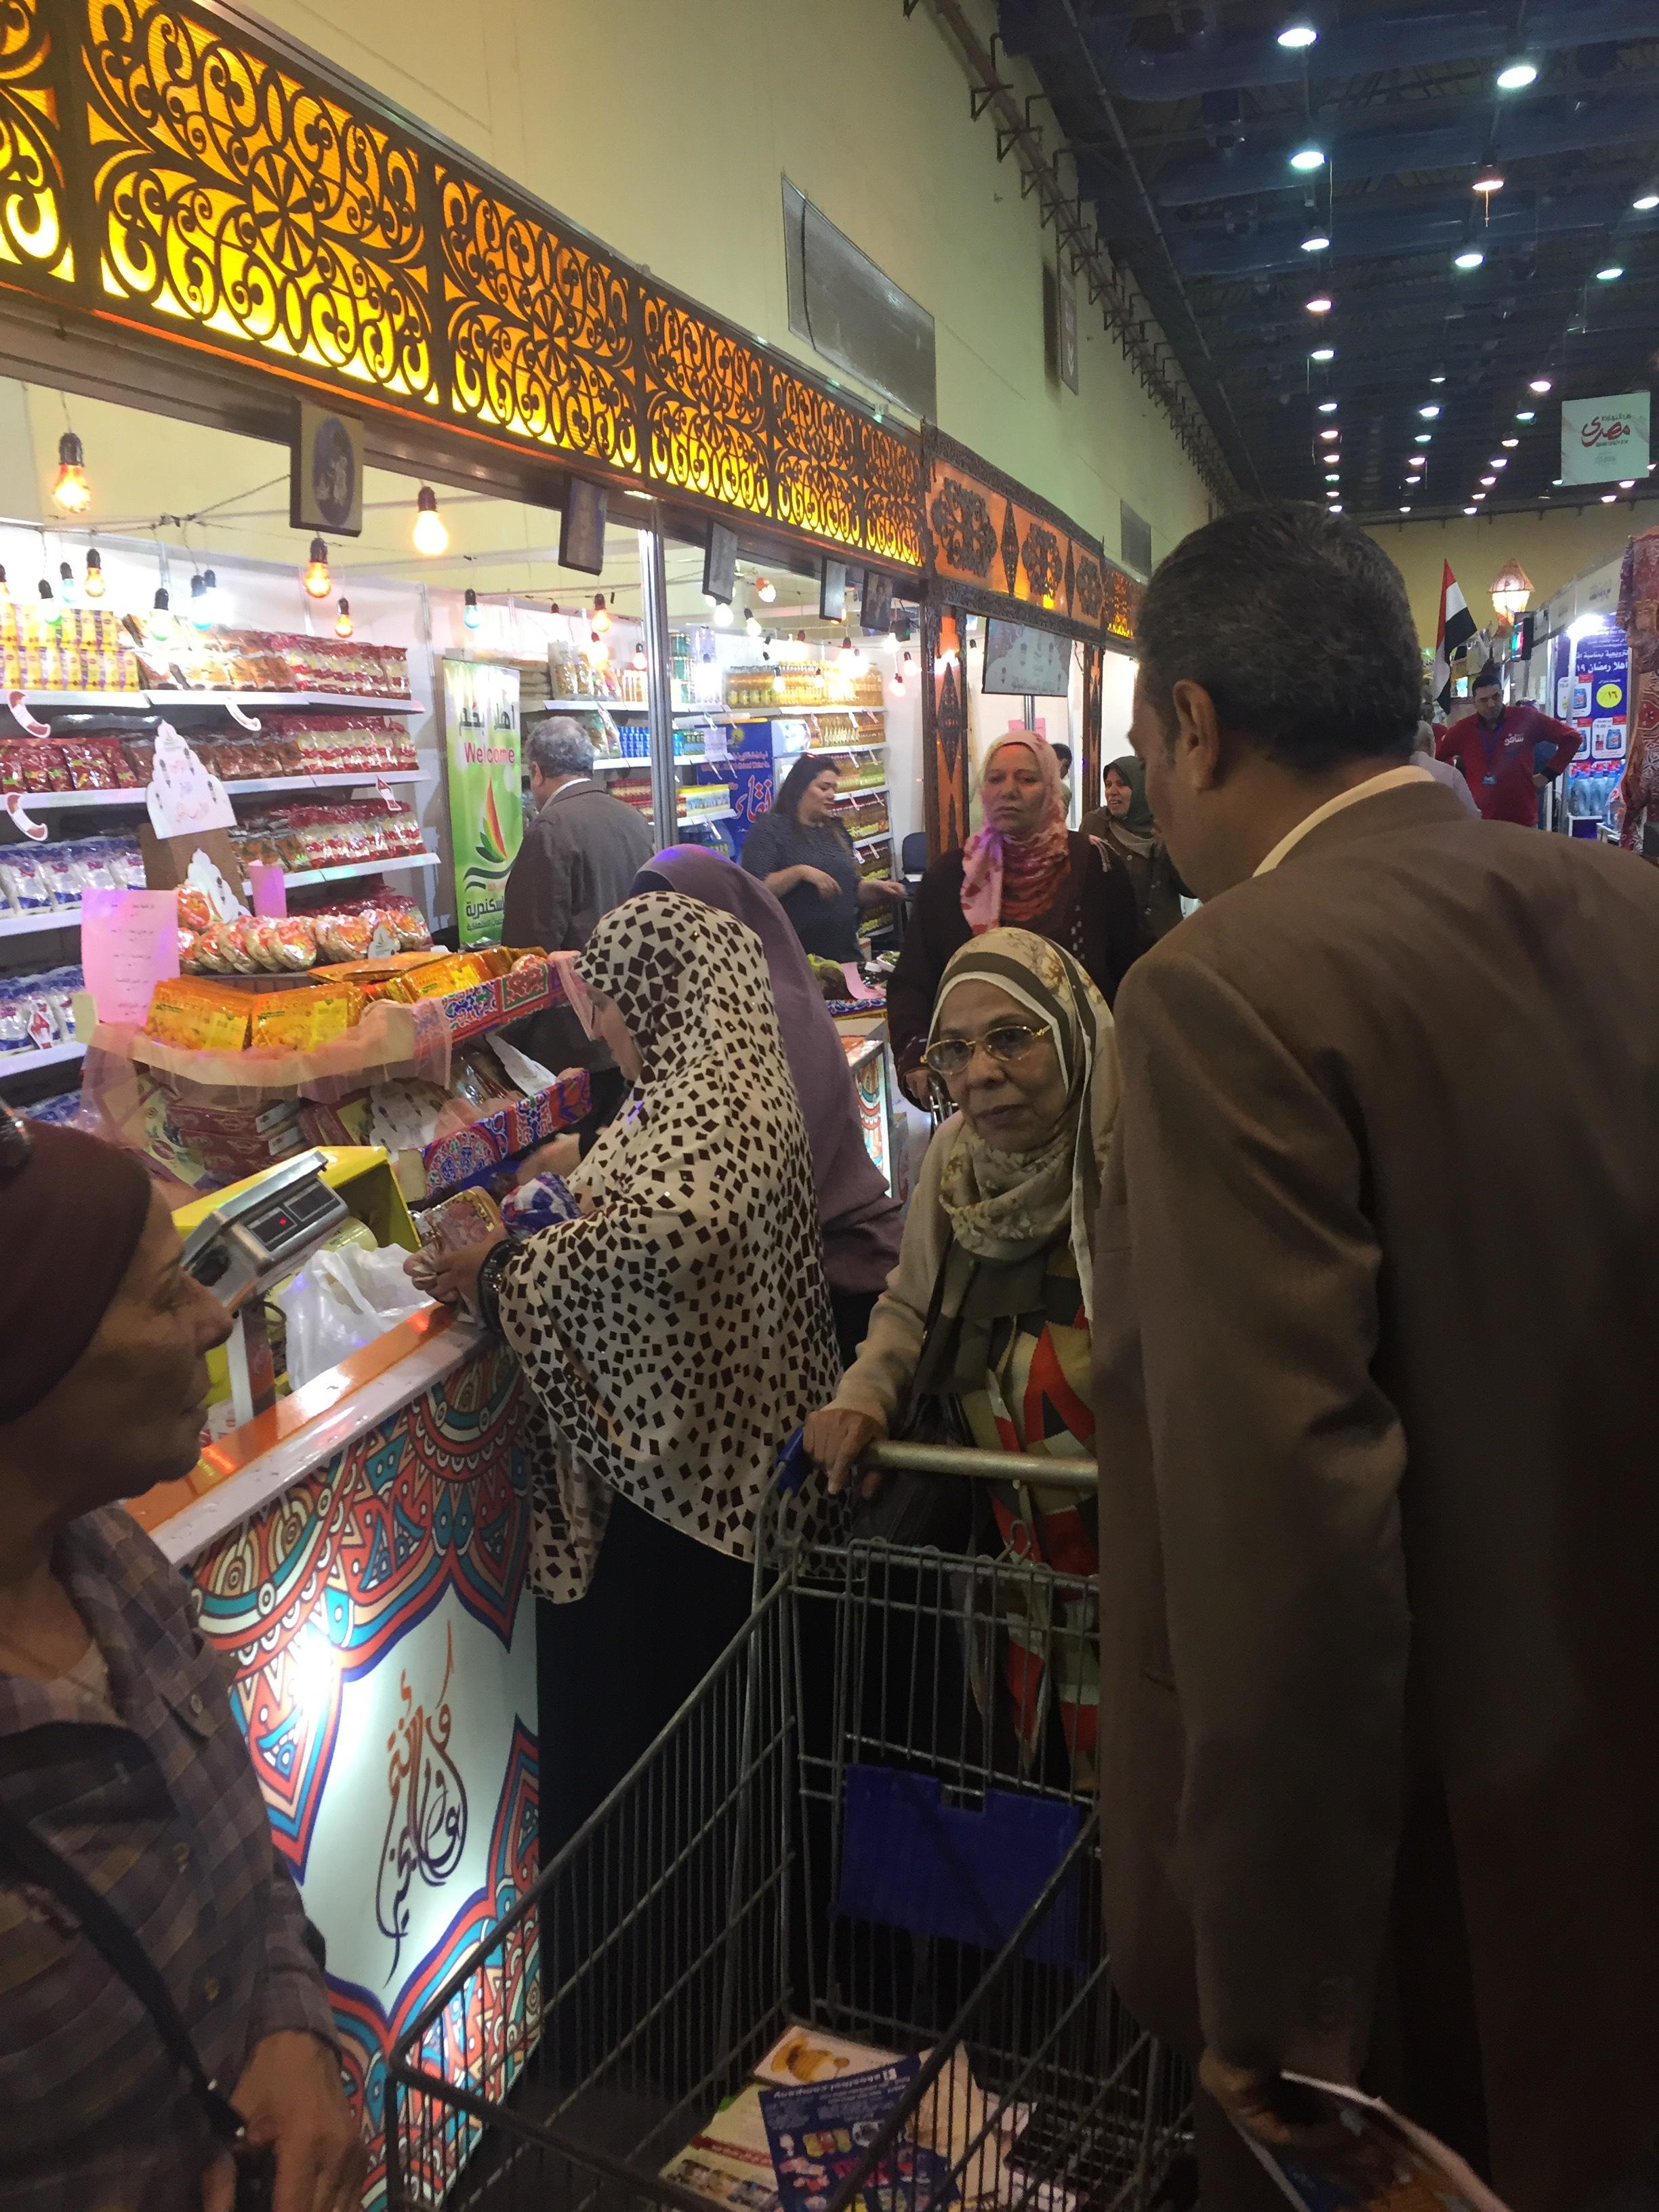 معرض سوبر ماركت أهلا رمضان (6)